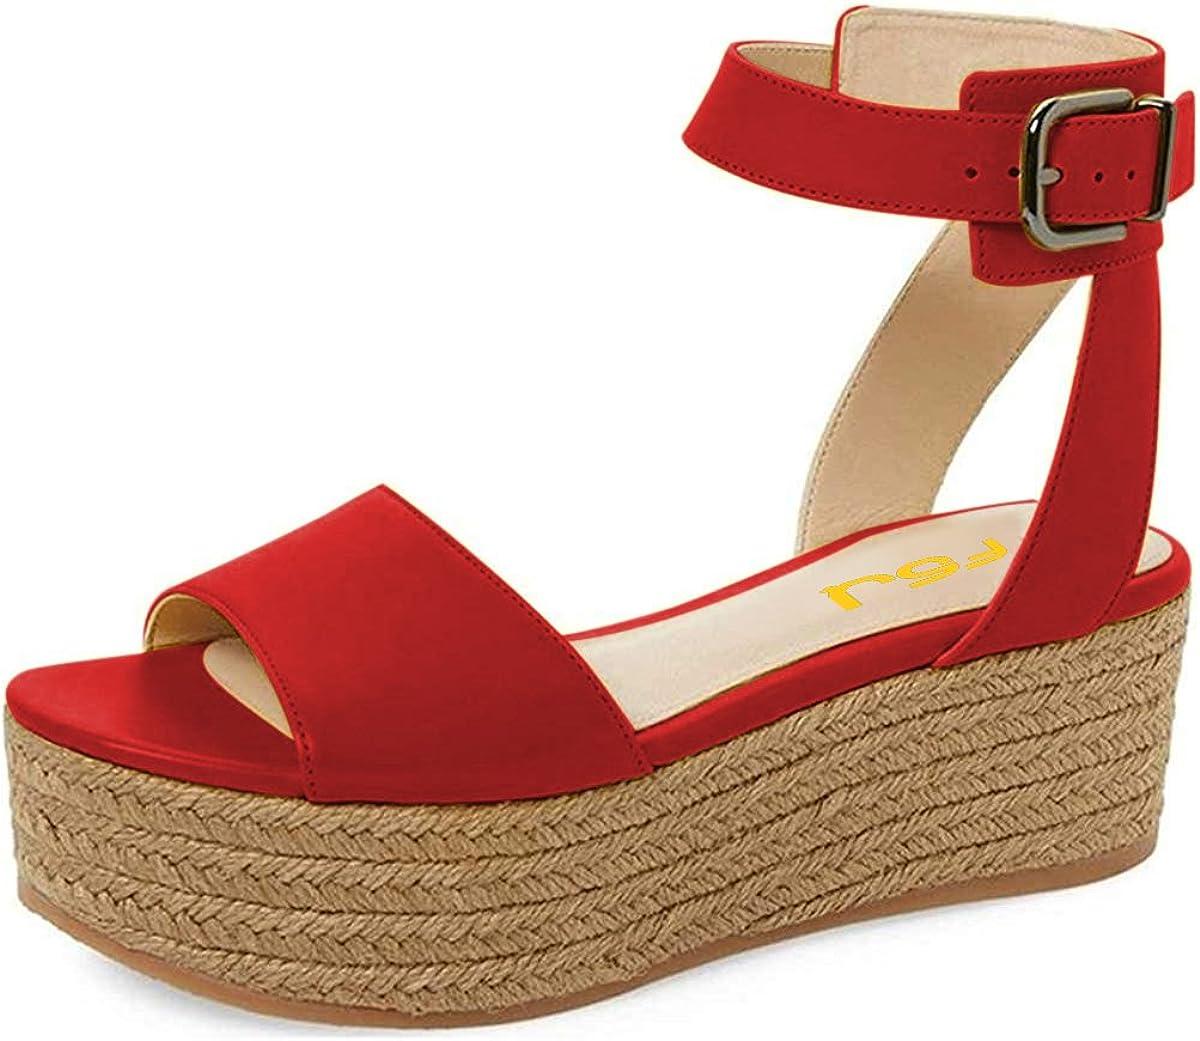 Womens Summer Wedges Espadrilles Sandals Ladies Ankle Strap Platform Shoes Size